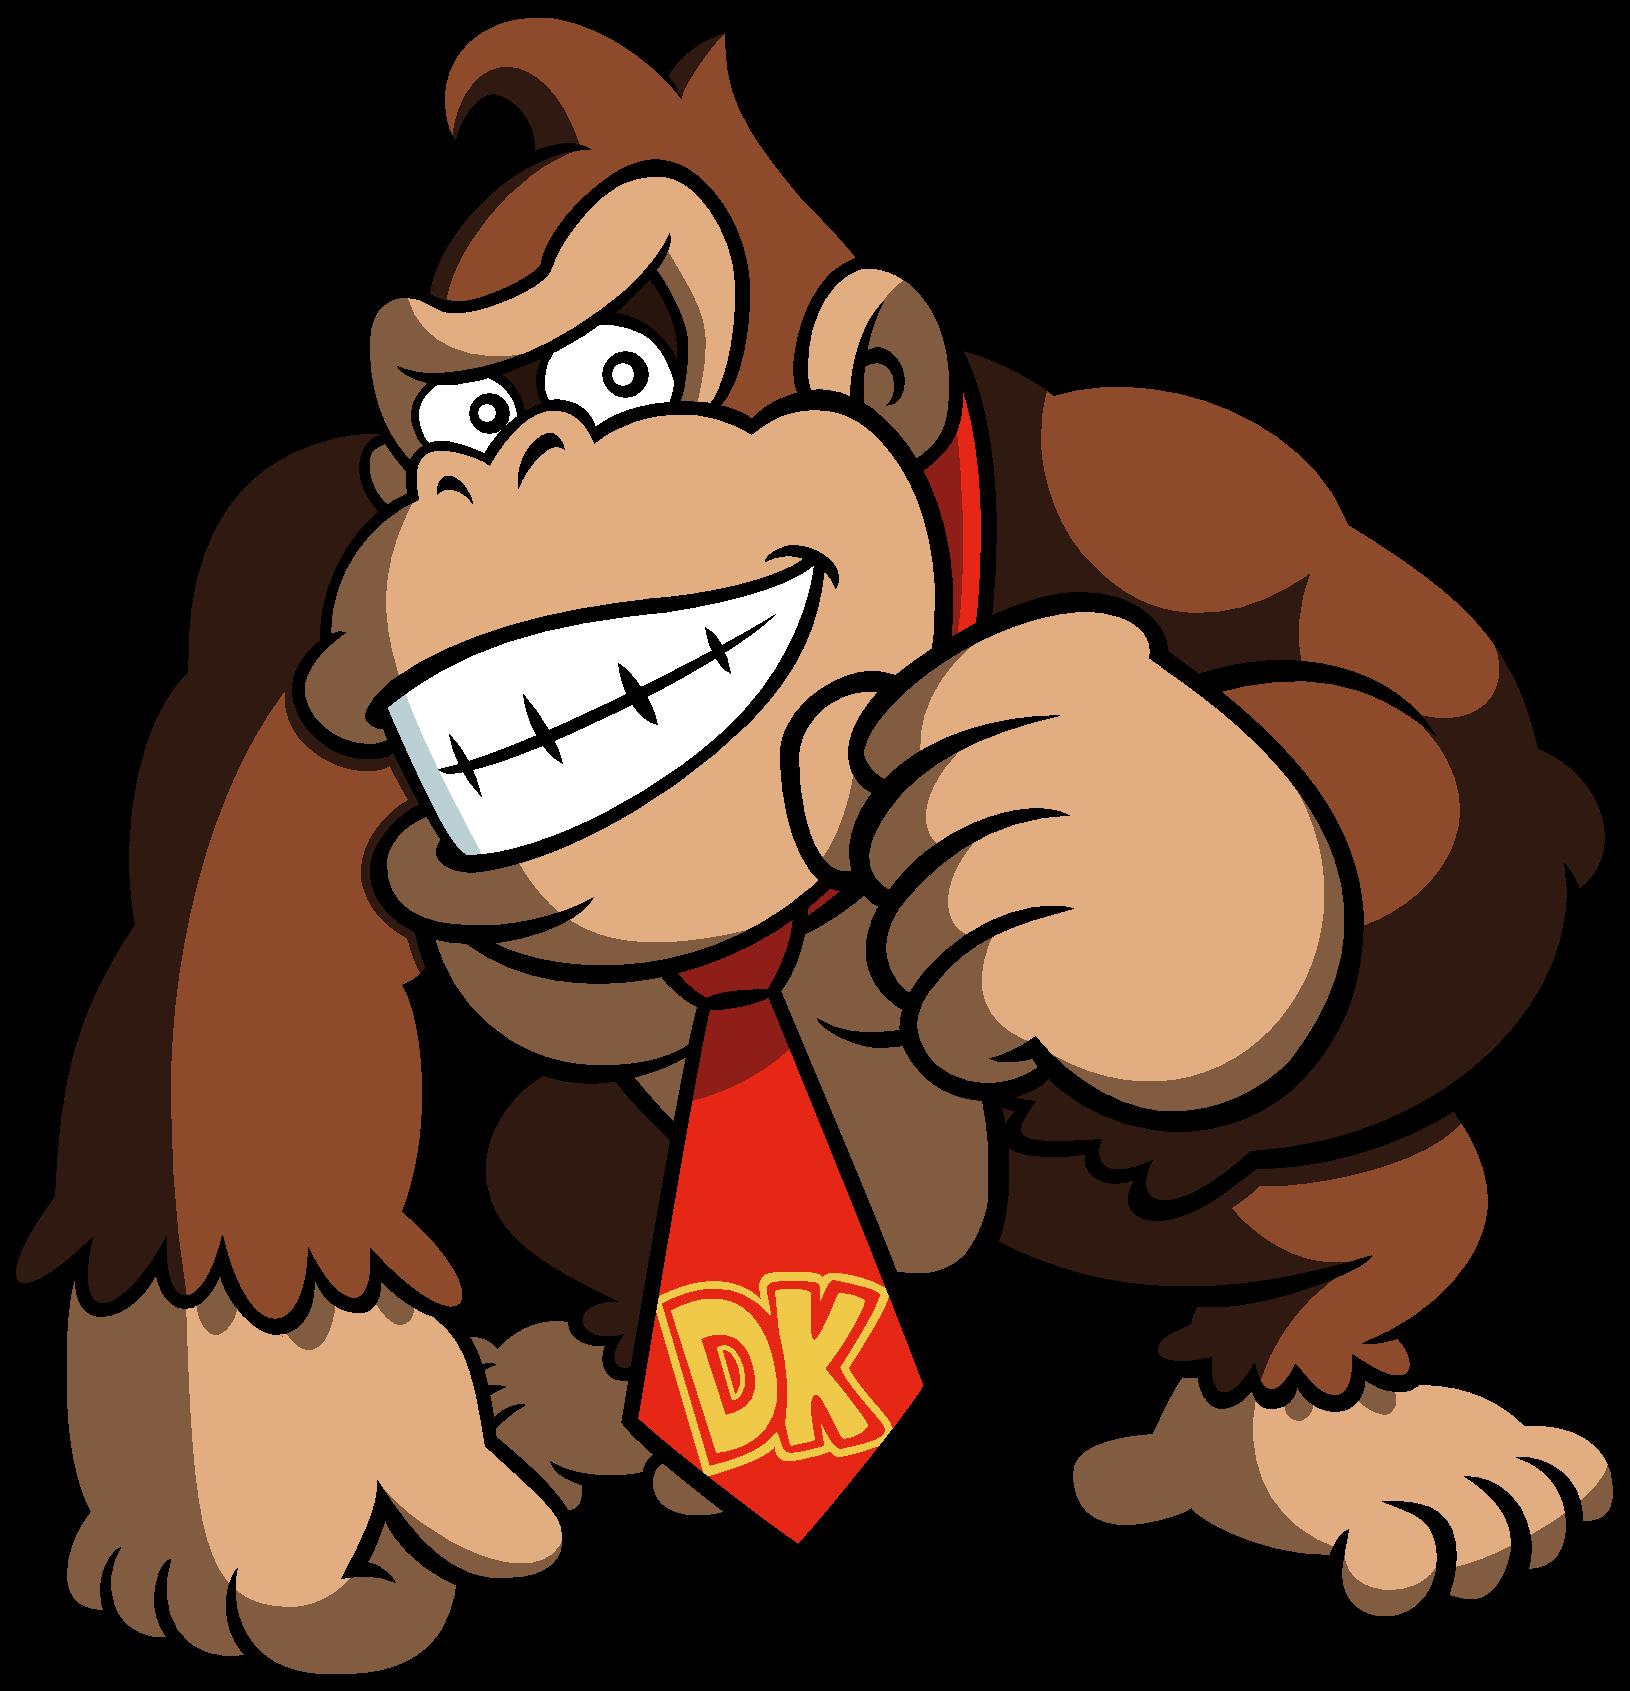 super mario by blistinaorgin on deviantart rh blistinaorgin deviantart com King Kong Silhouette King Kong Shadow Clip Art